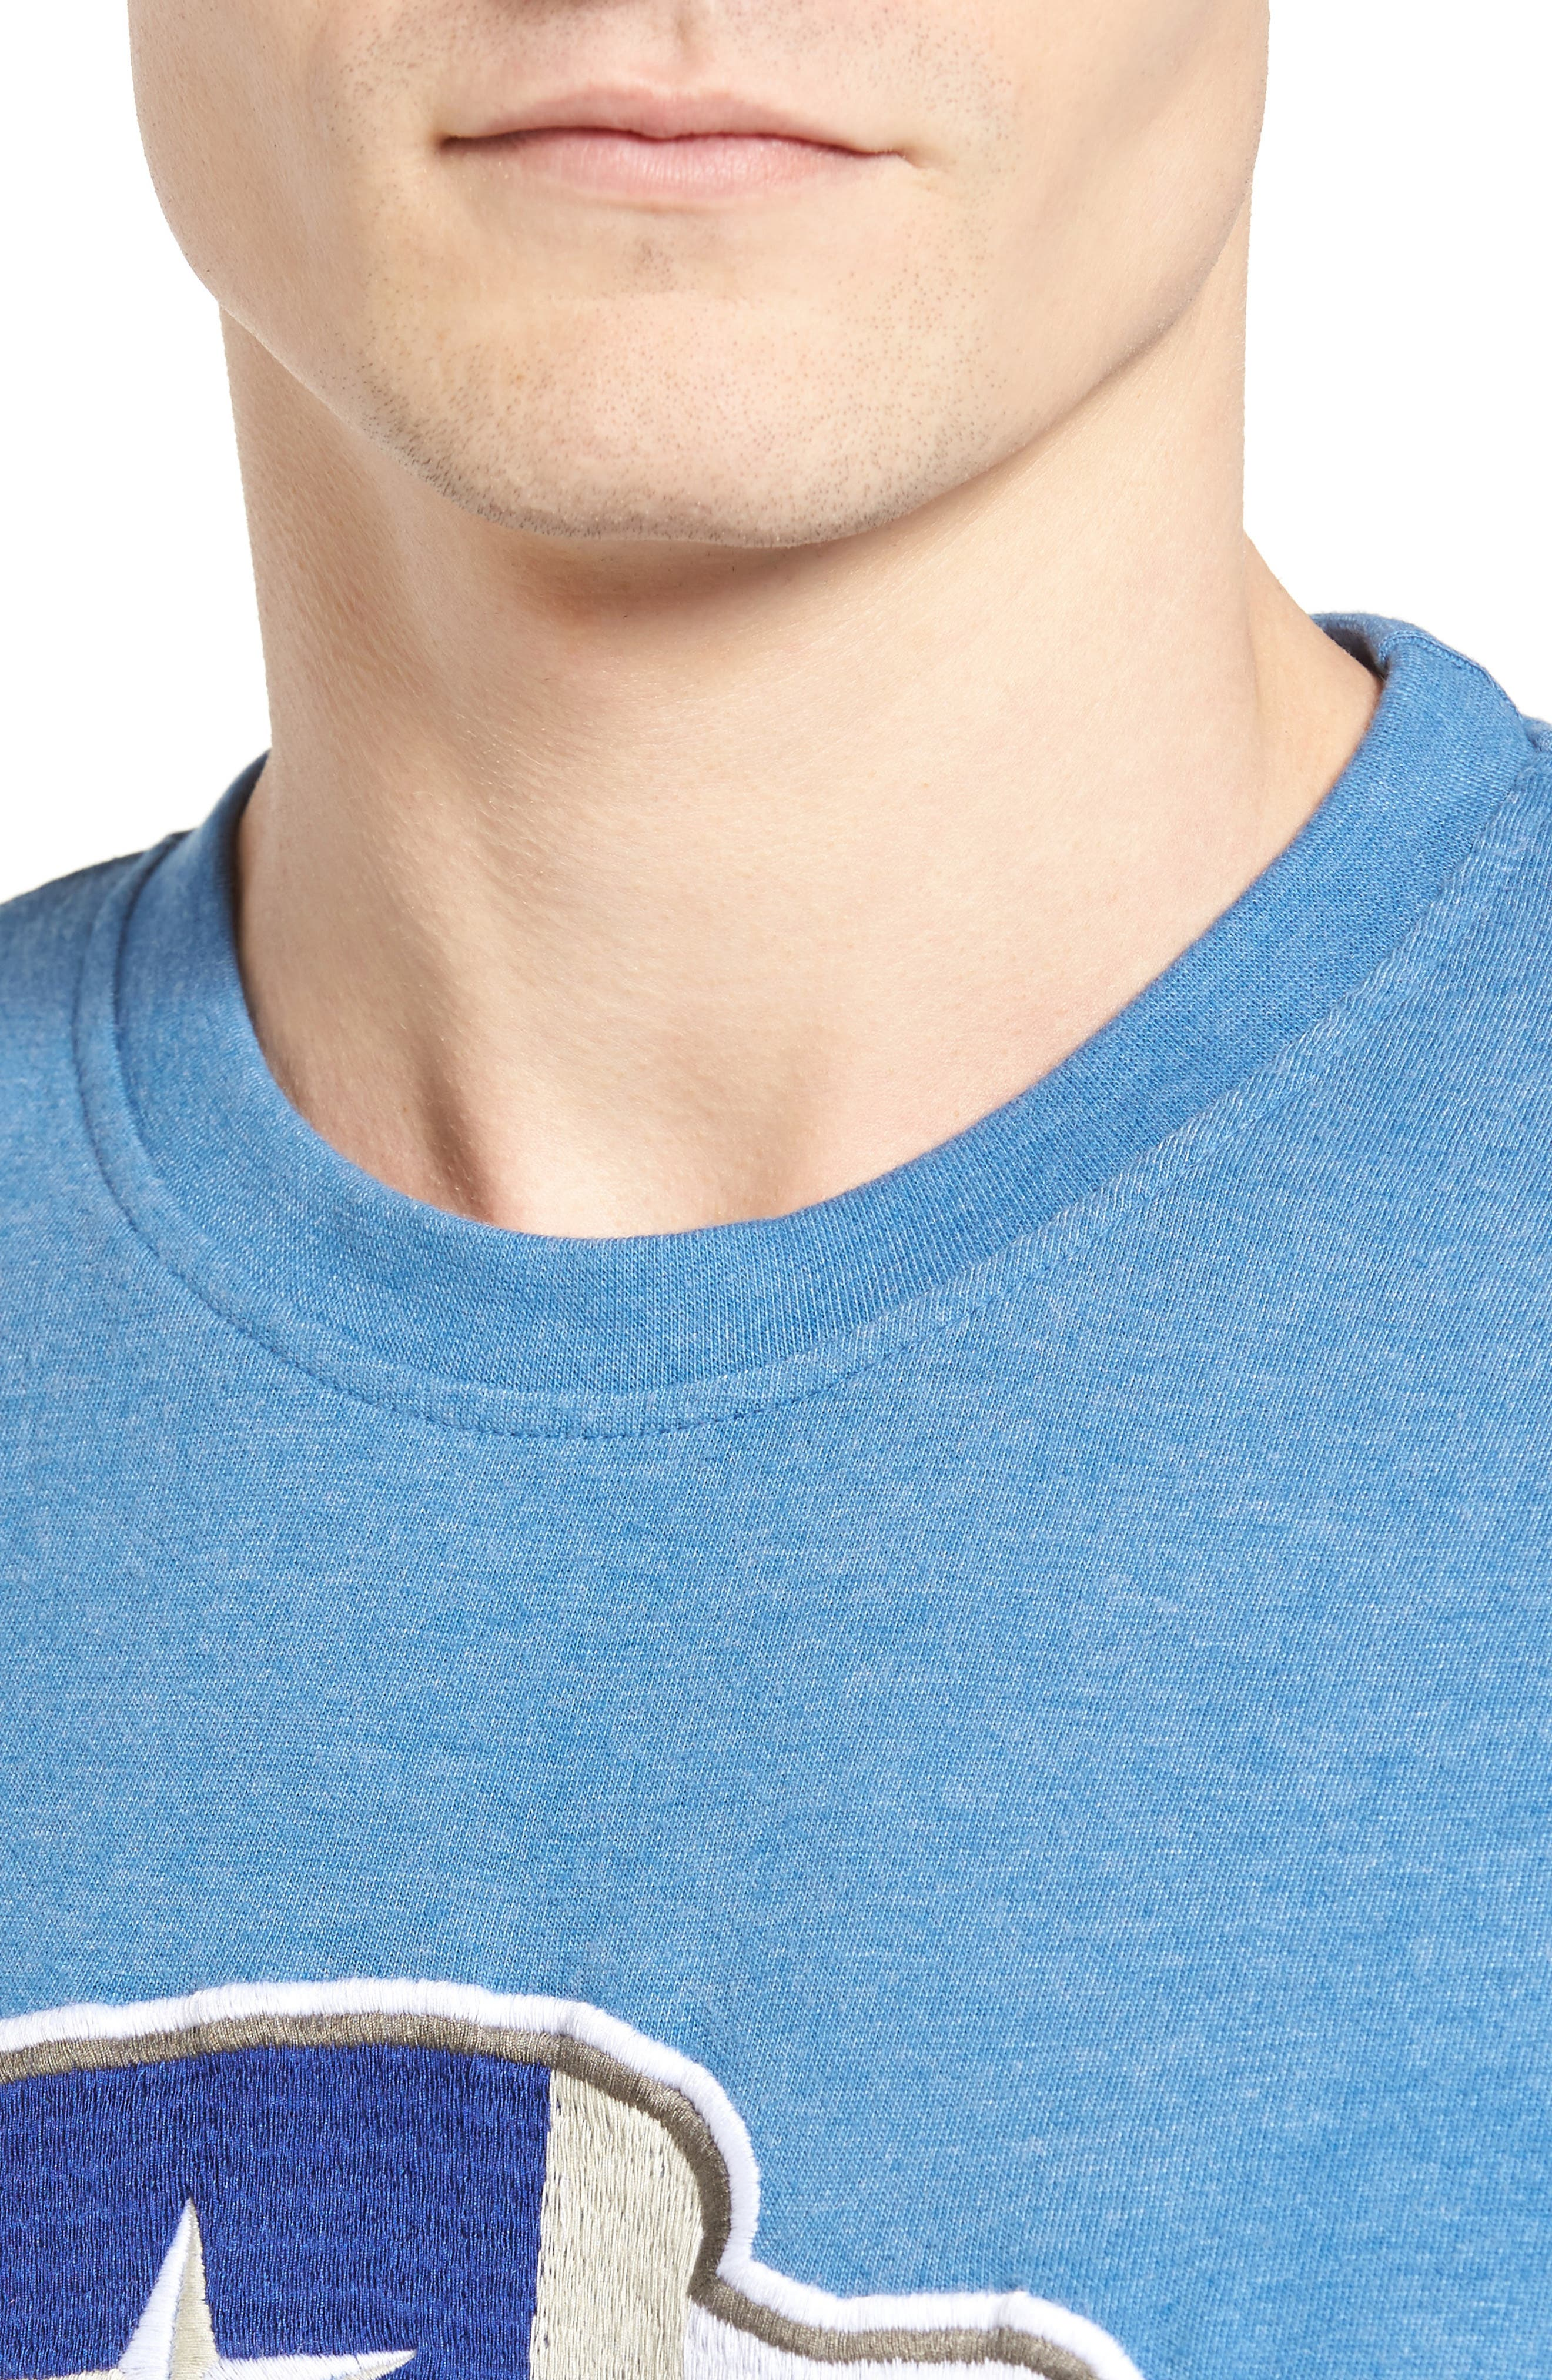 Hillwood Texas Rangers T-Shirt,                             Alternate thumbnail 4, color,                             450